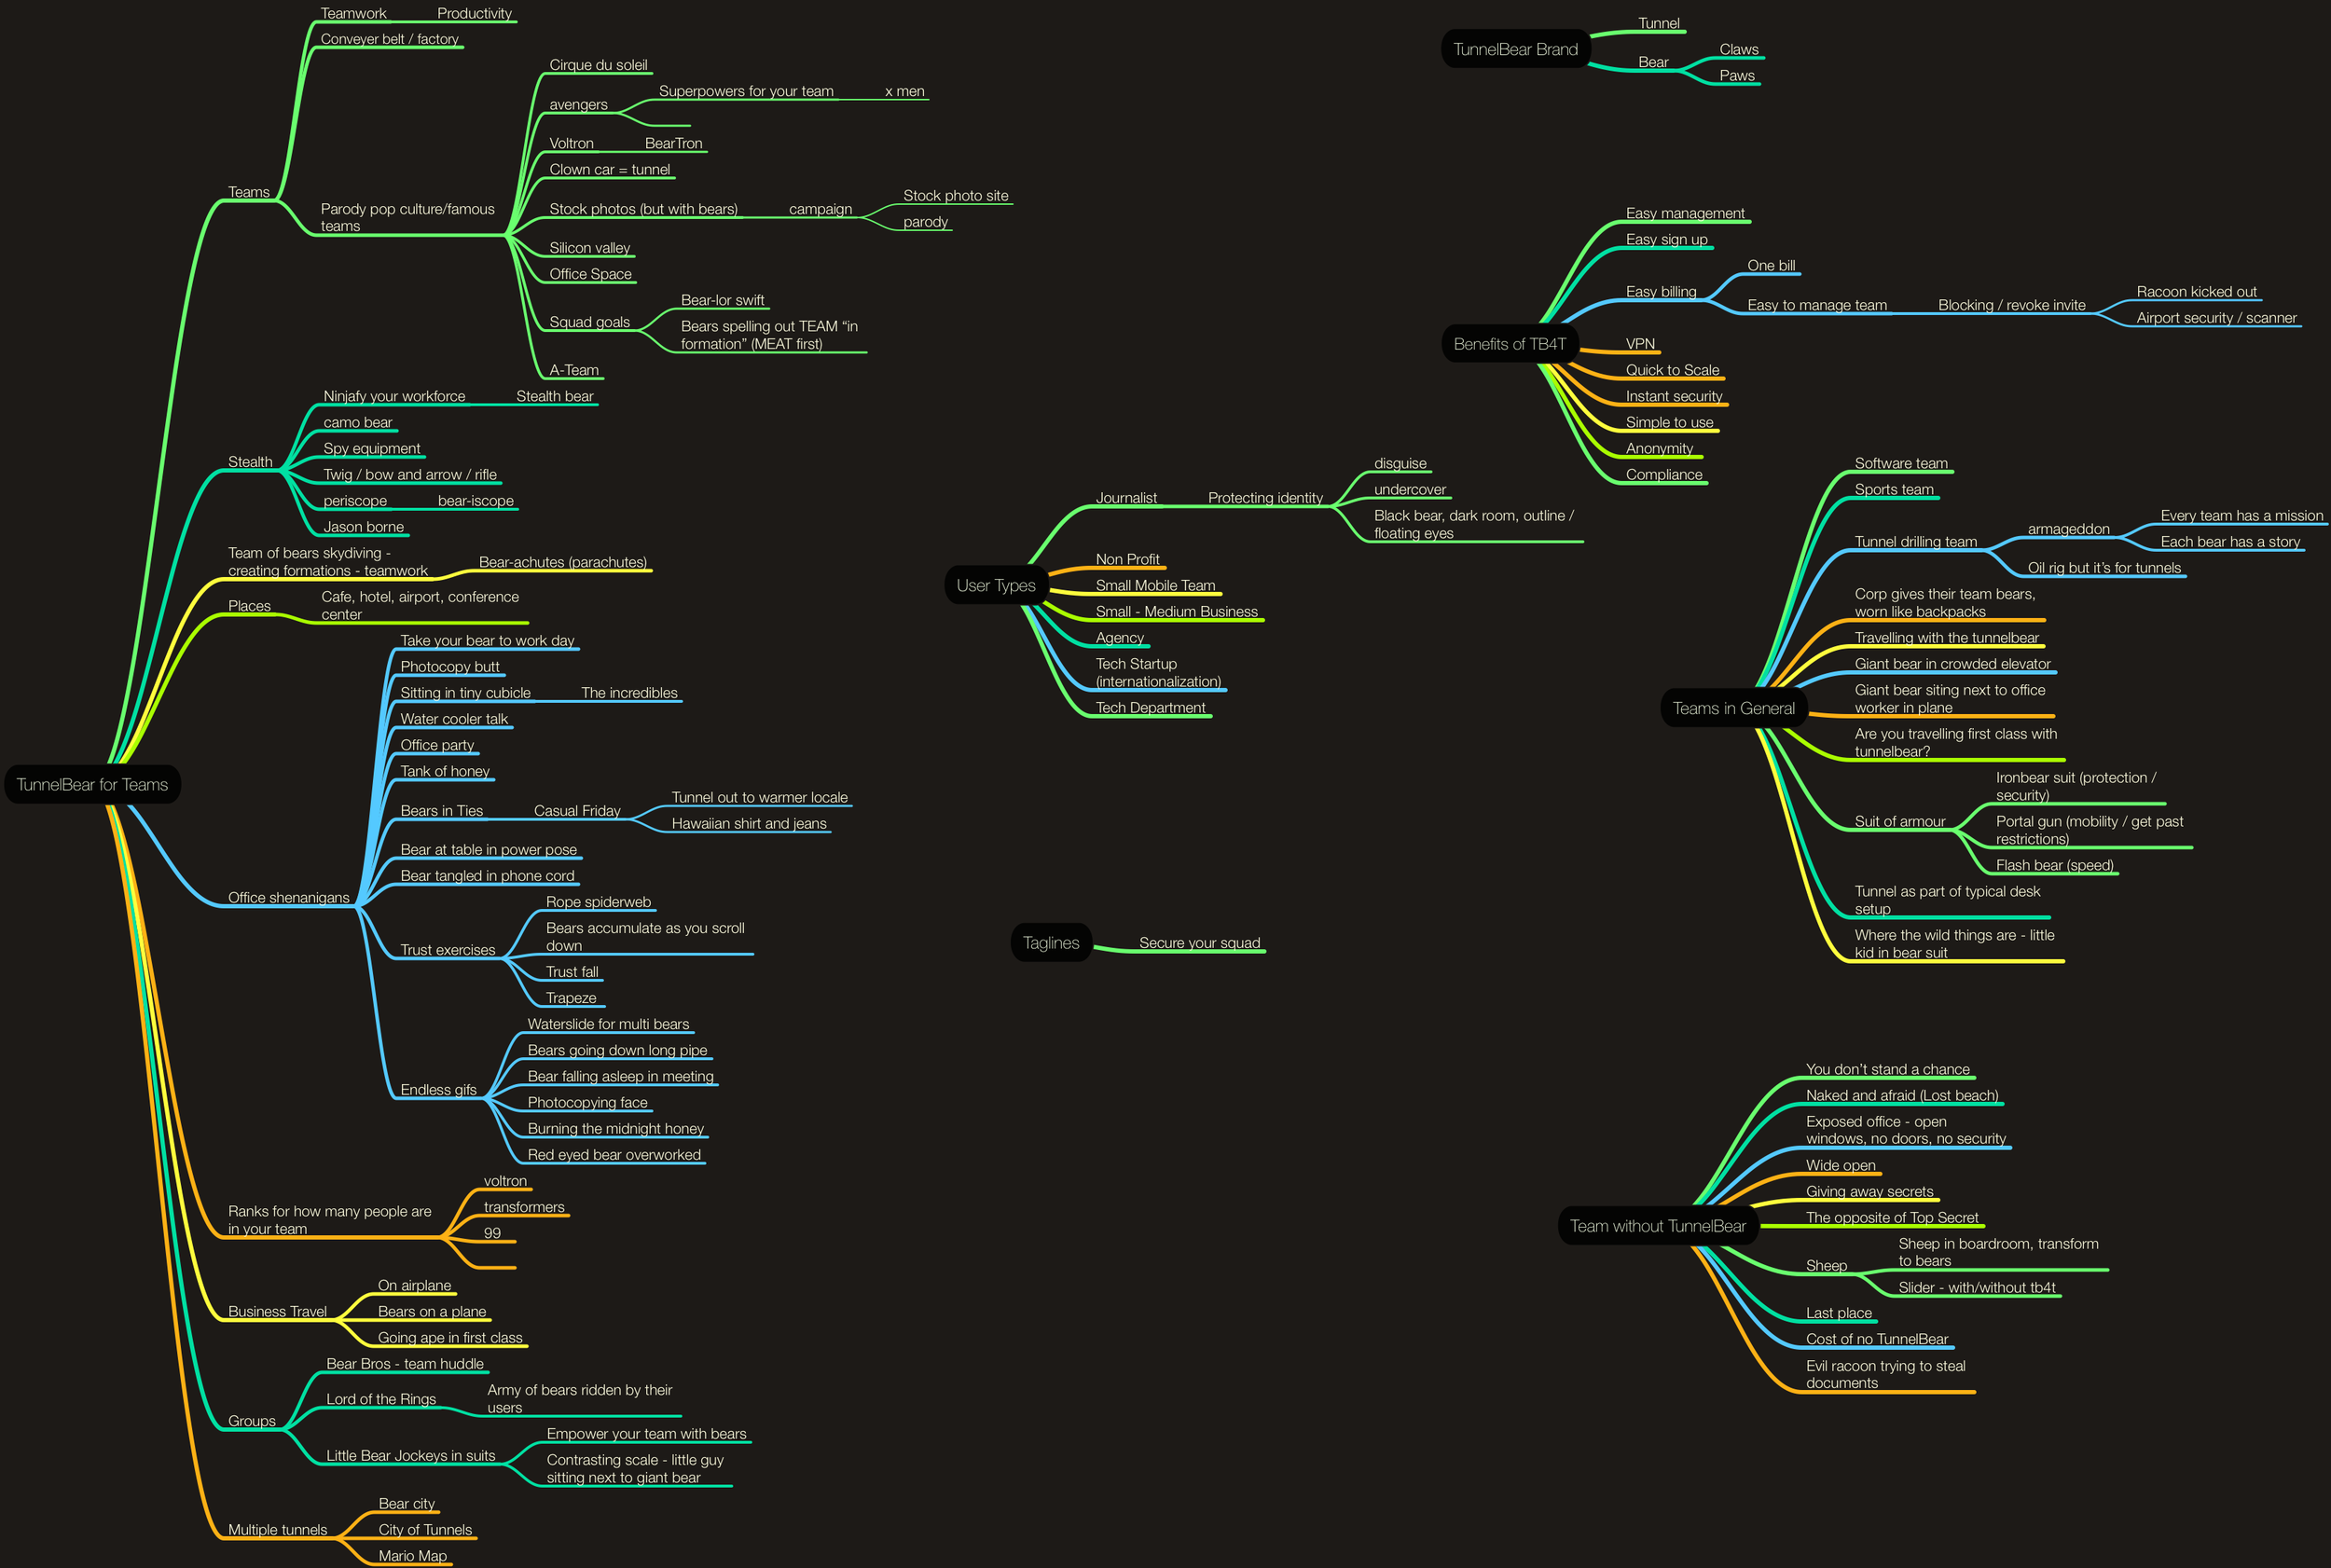 Mindmap Brainstorm of Creative Directions